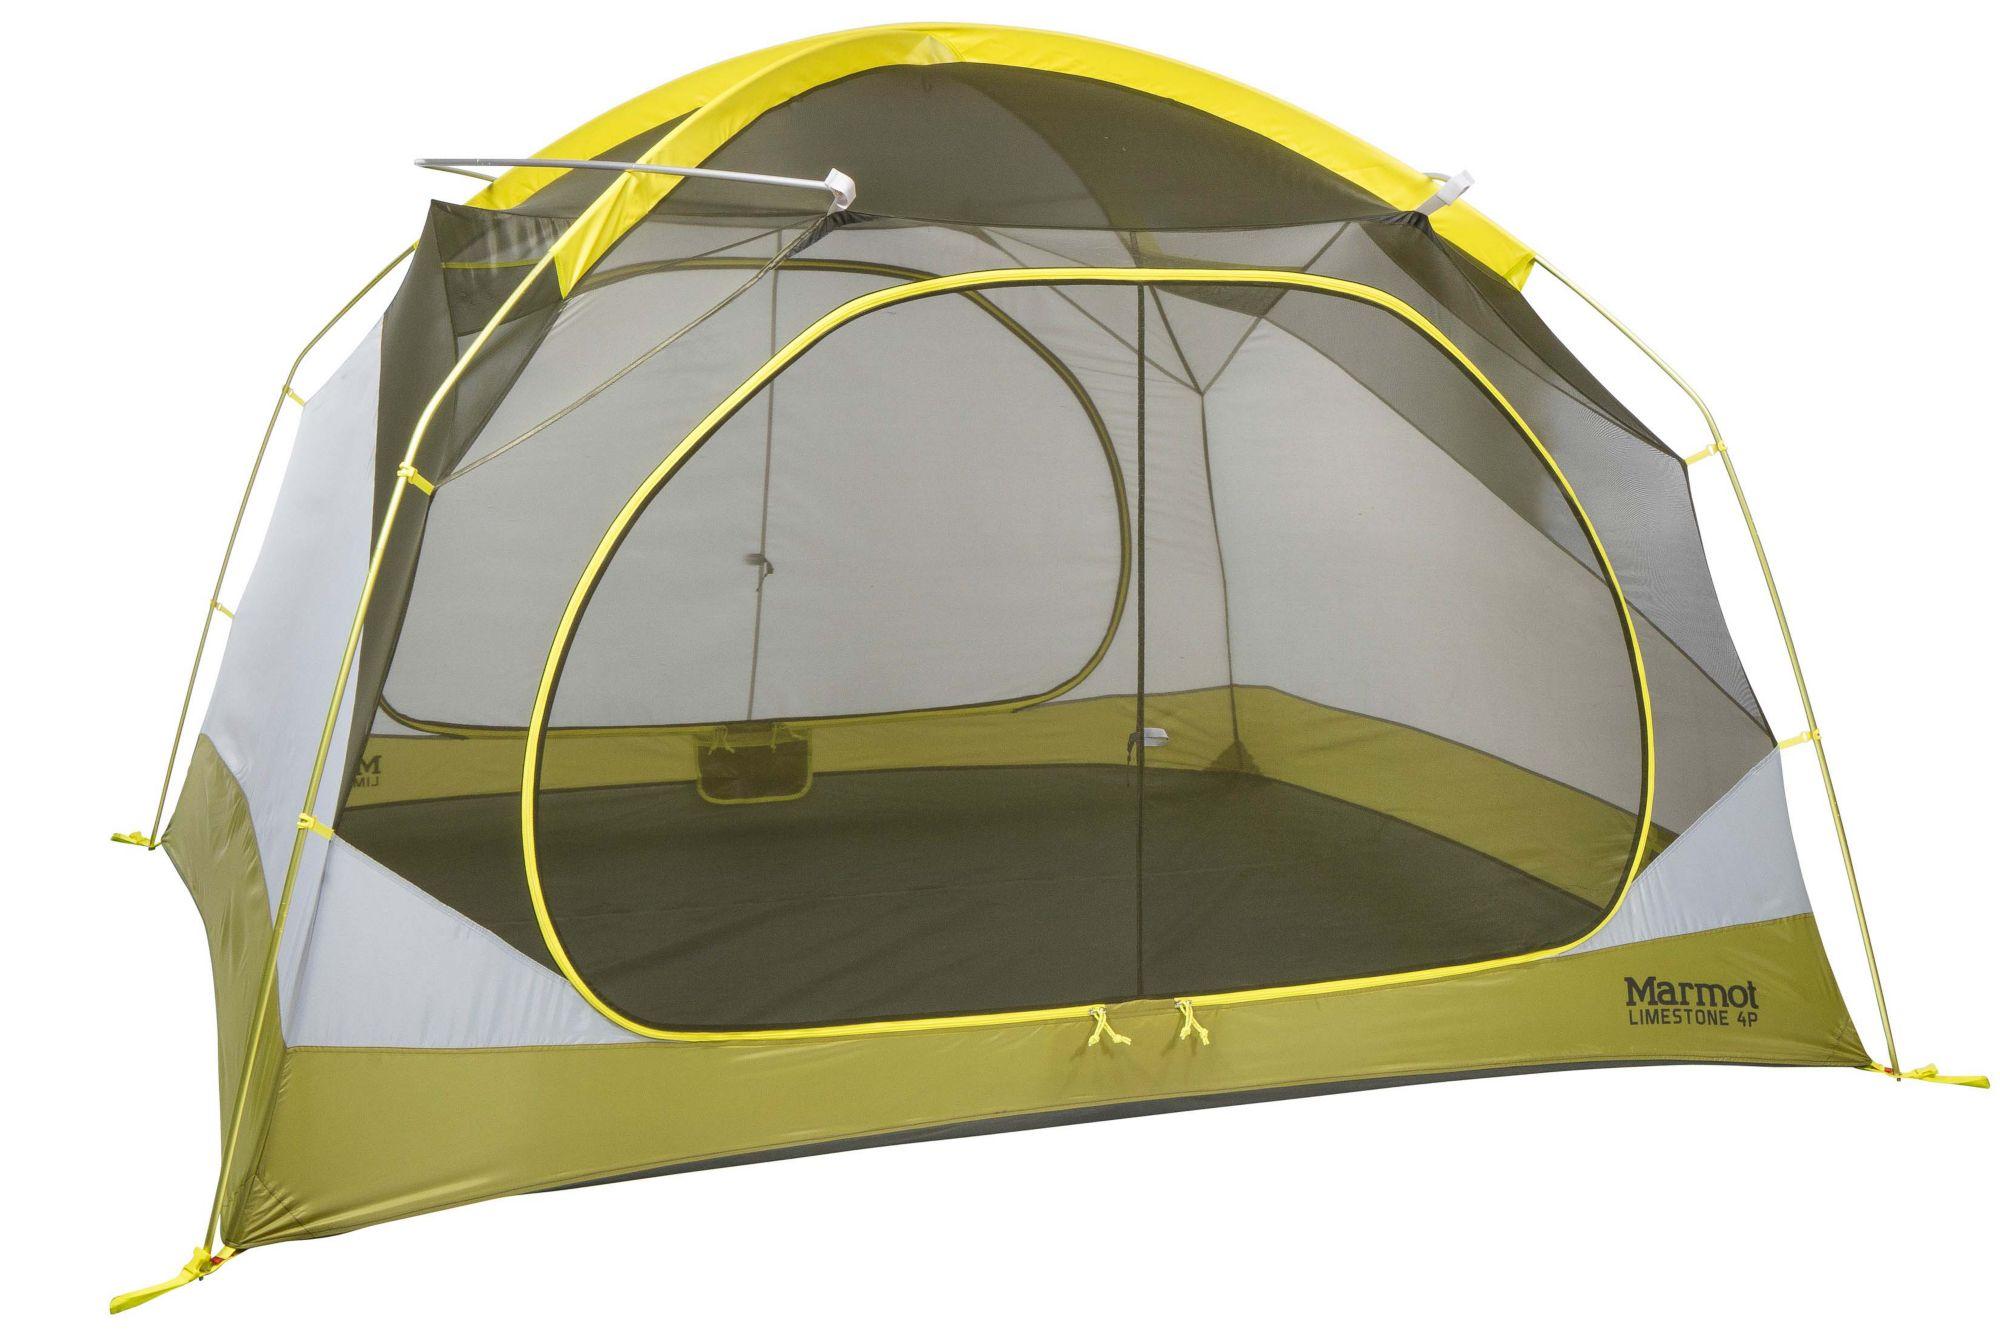 Limestone 4-Person Tent Green Shadow/Moss medium  sc 1 st  Marmot & Tents / Equipment | Marmot.com